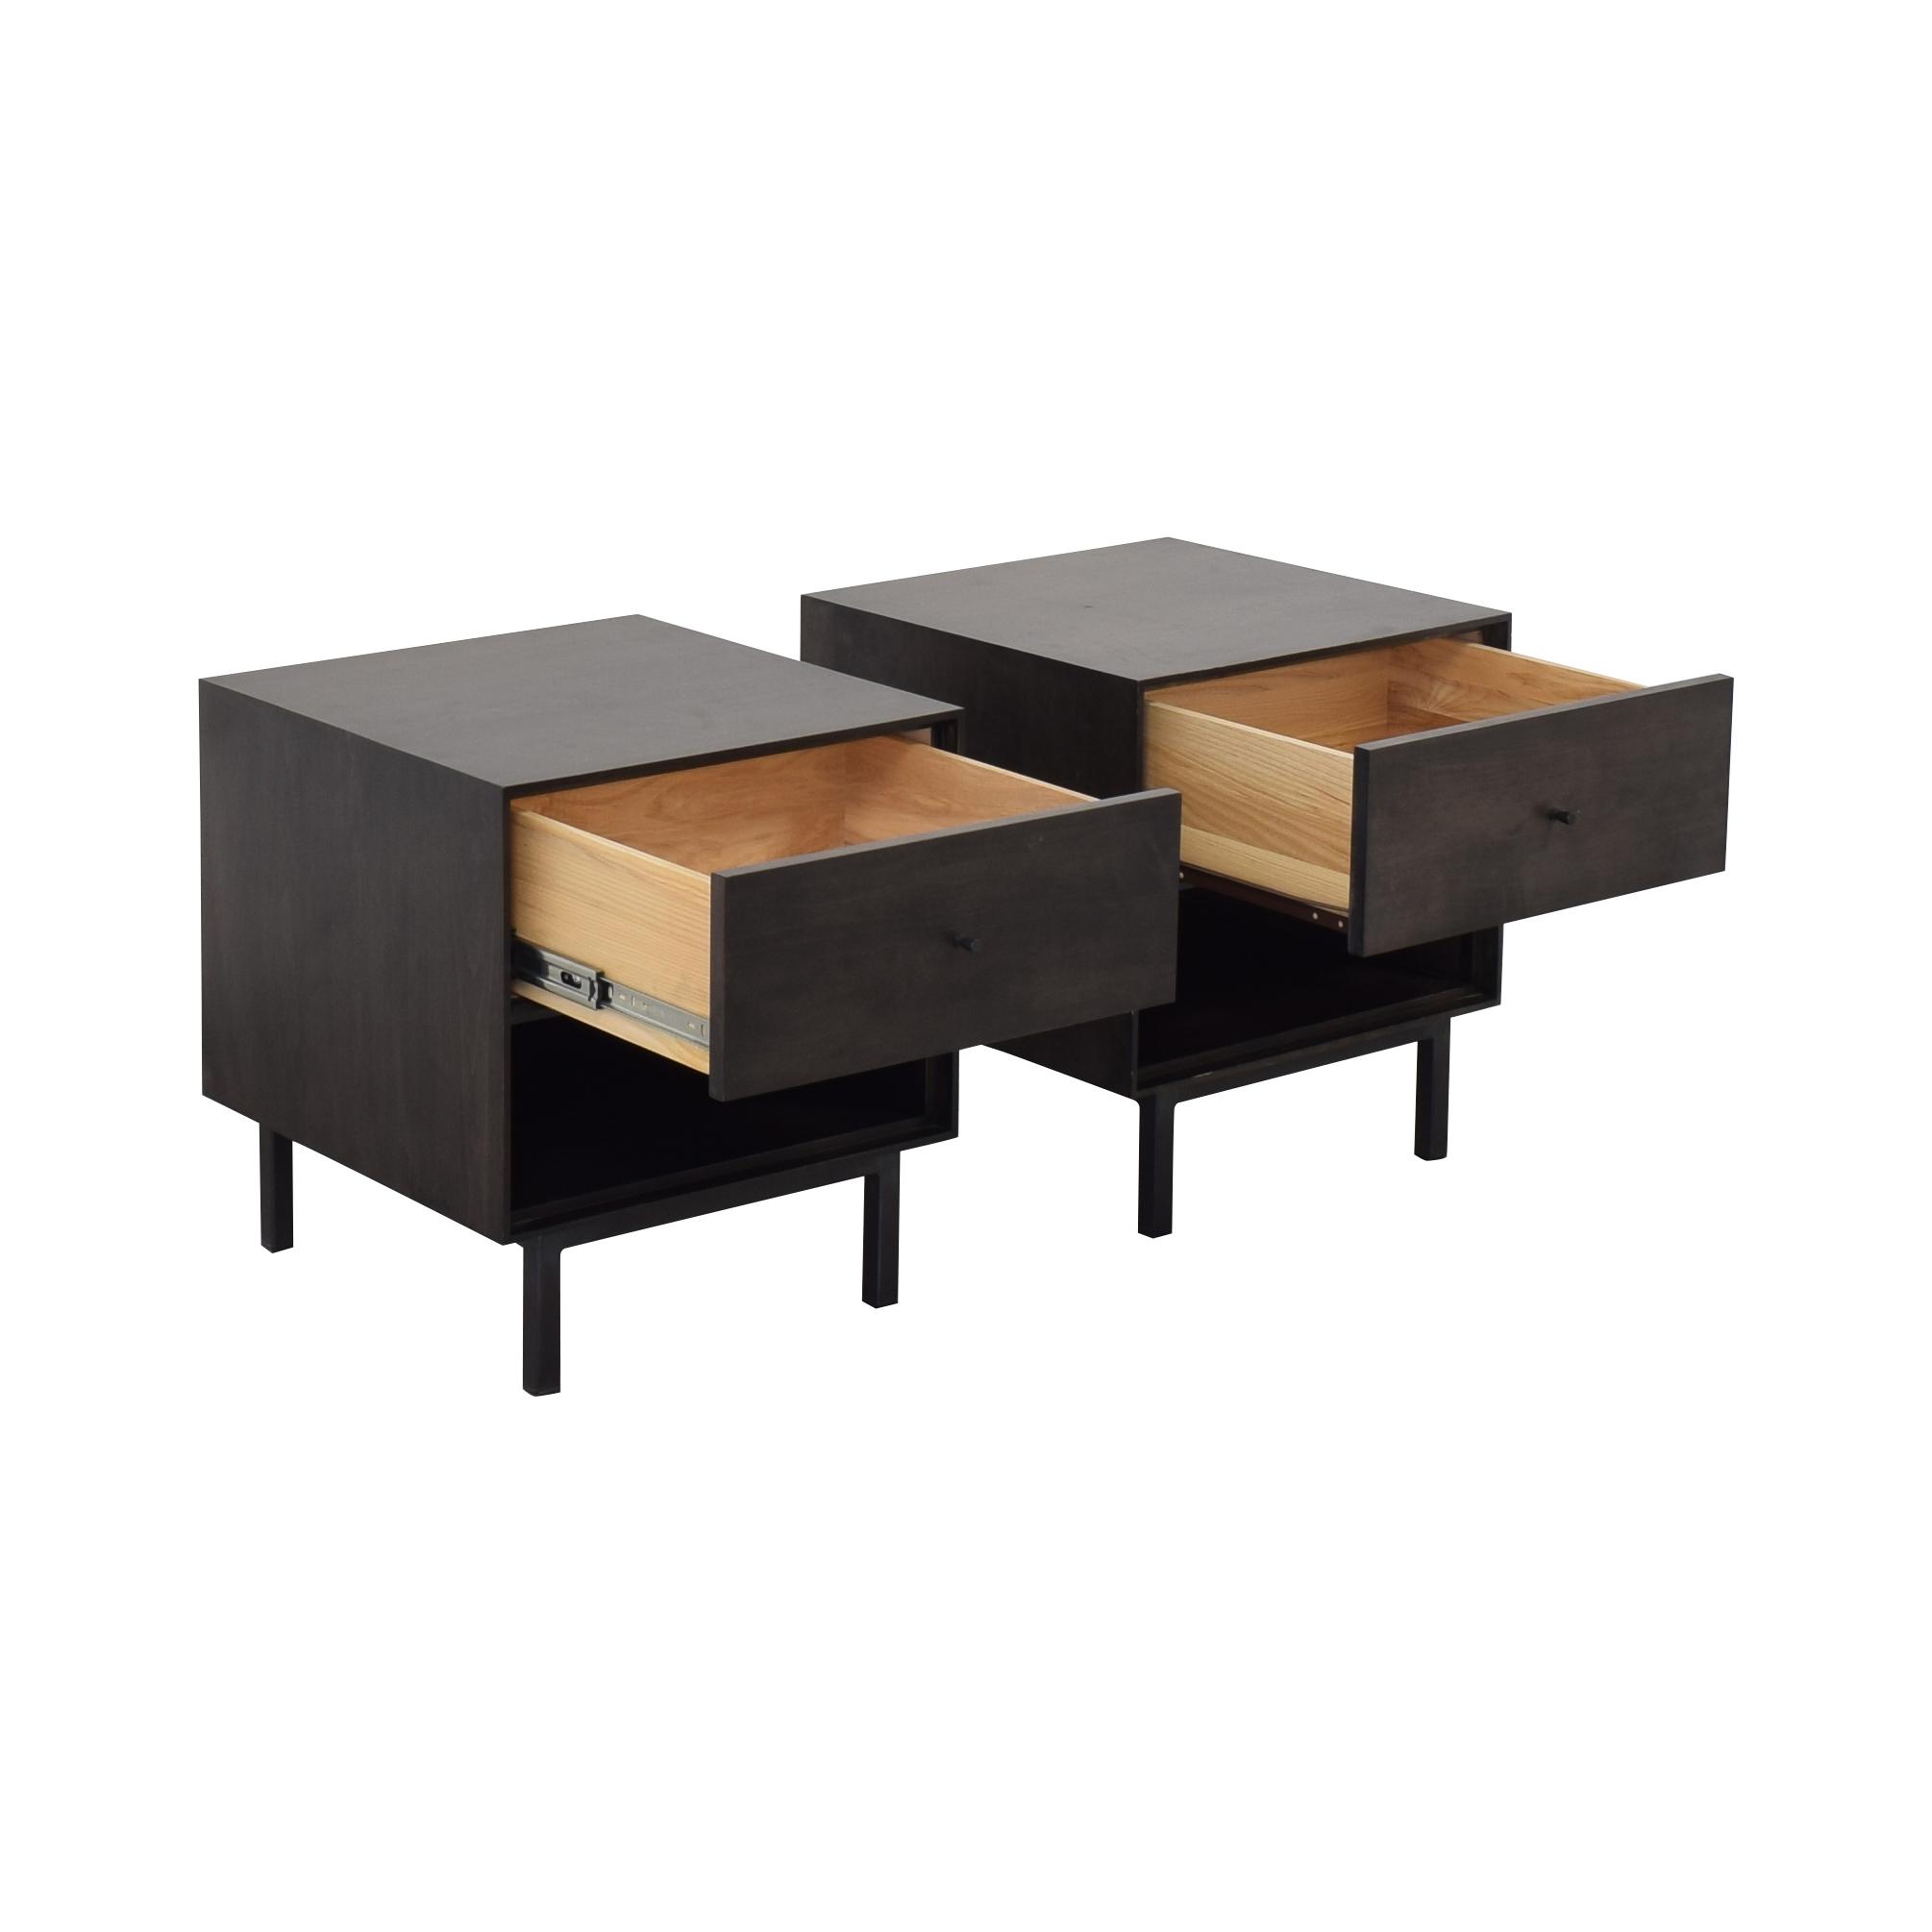 shop Room & Board Hudson Nightstands Room & Board Tables